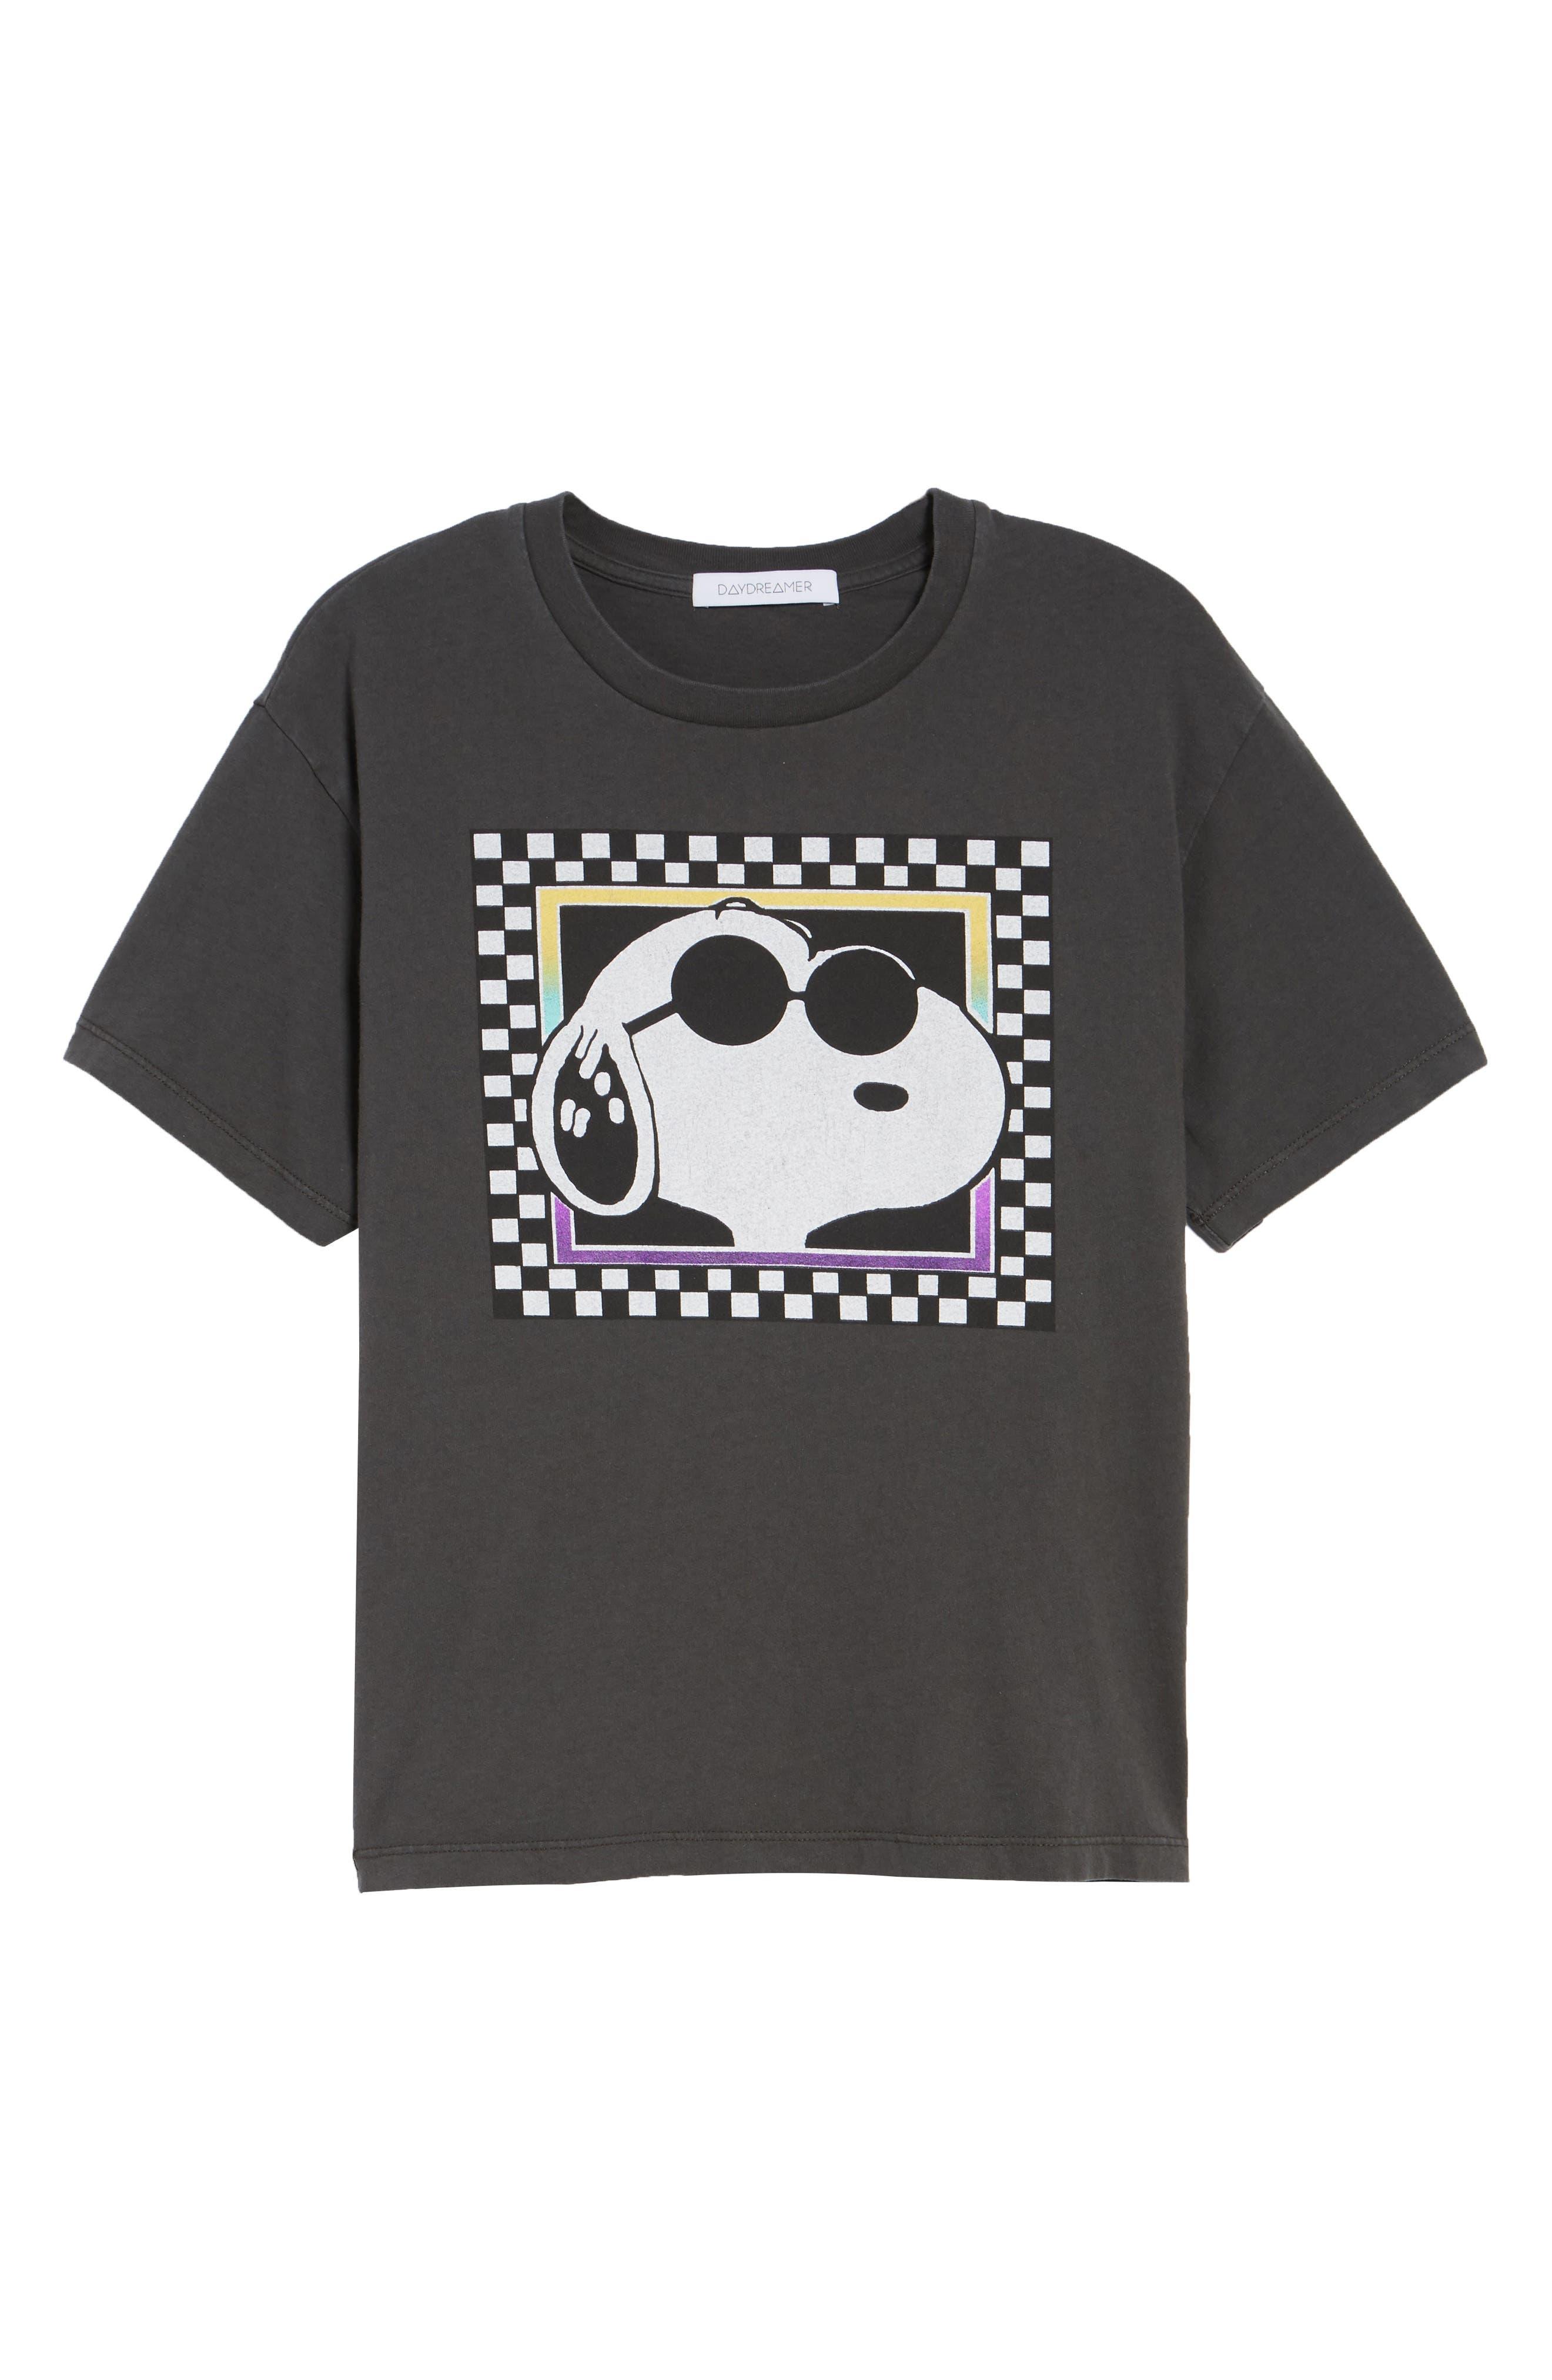 DAYDREAMER Joe Cool Checkerboard Tee in Black